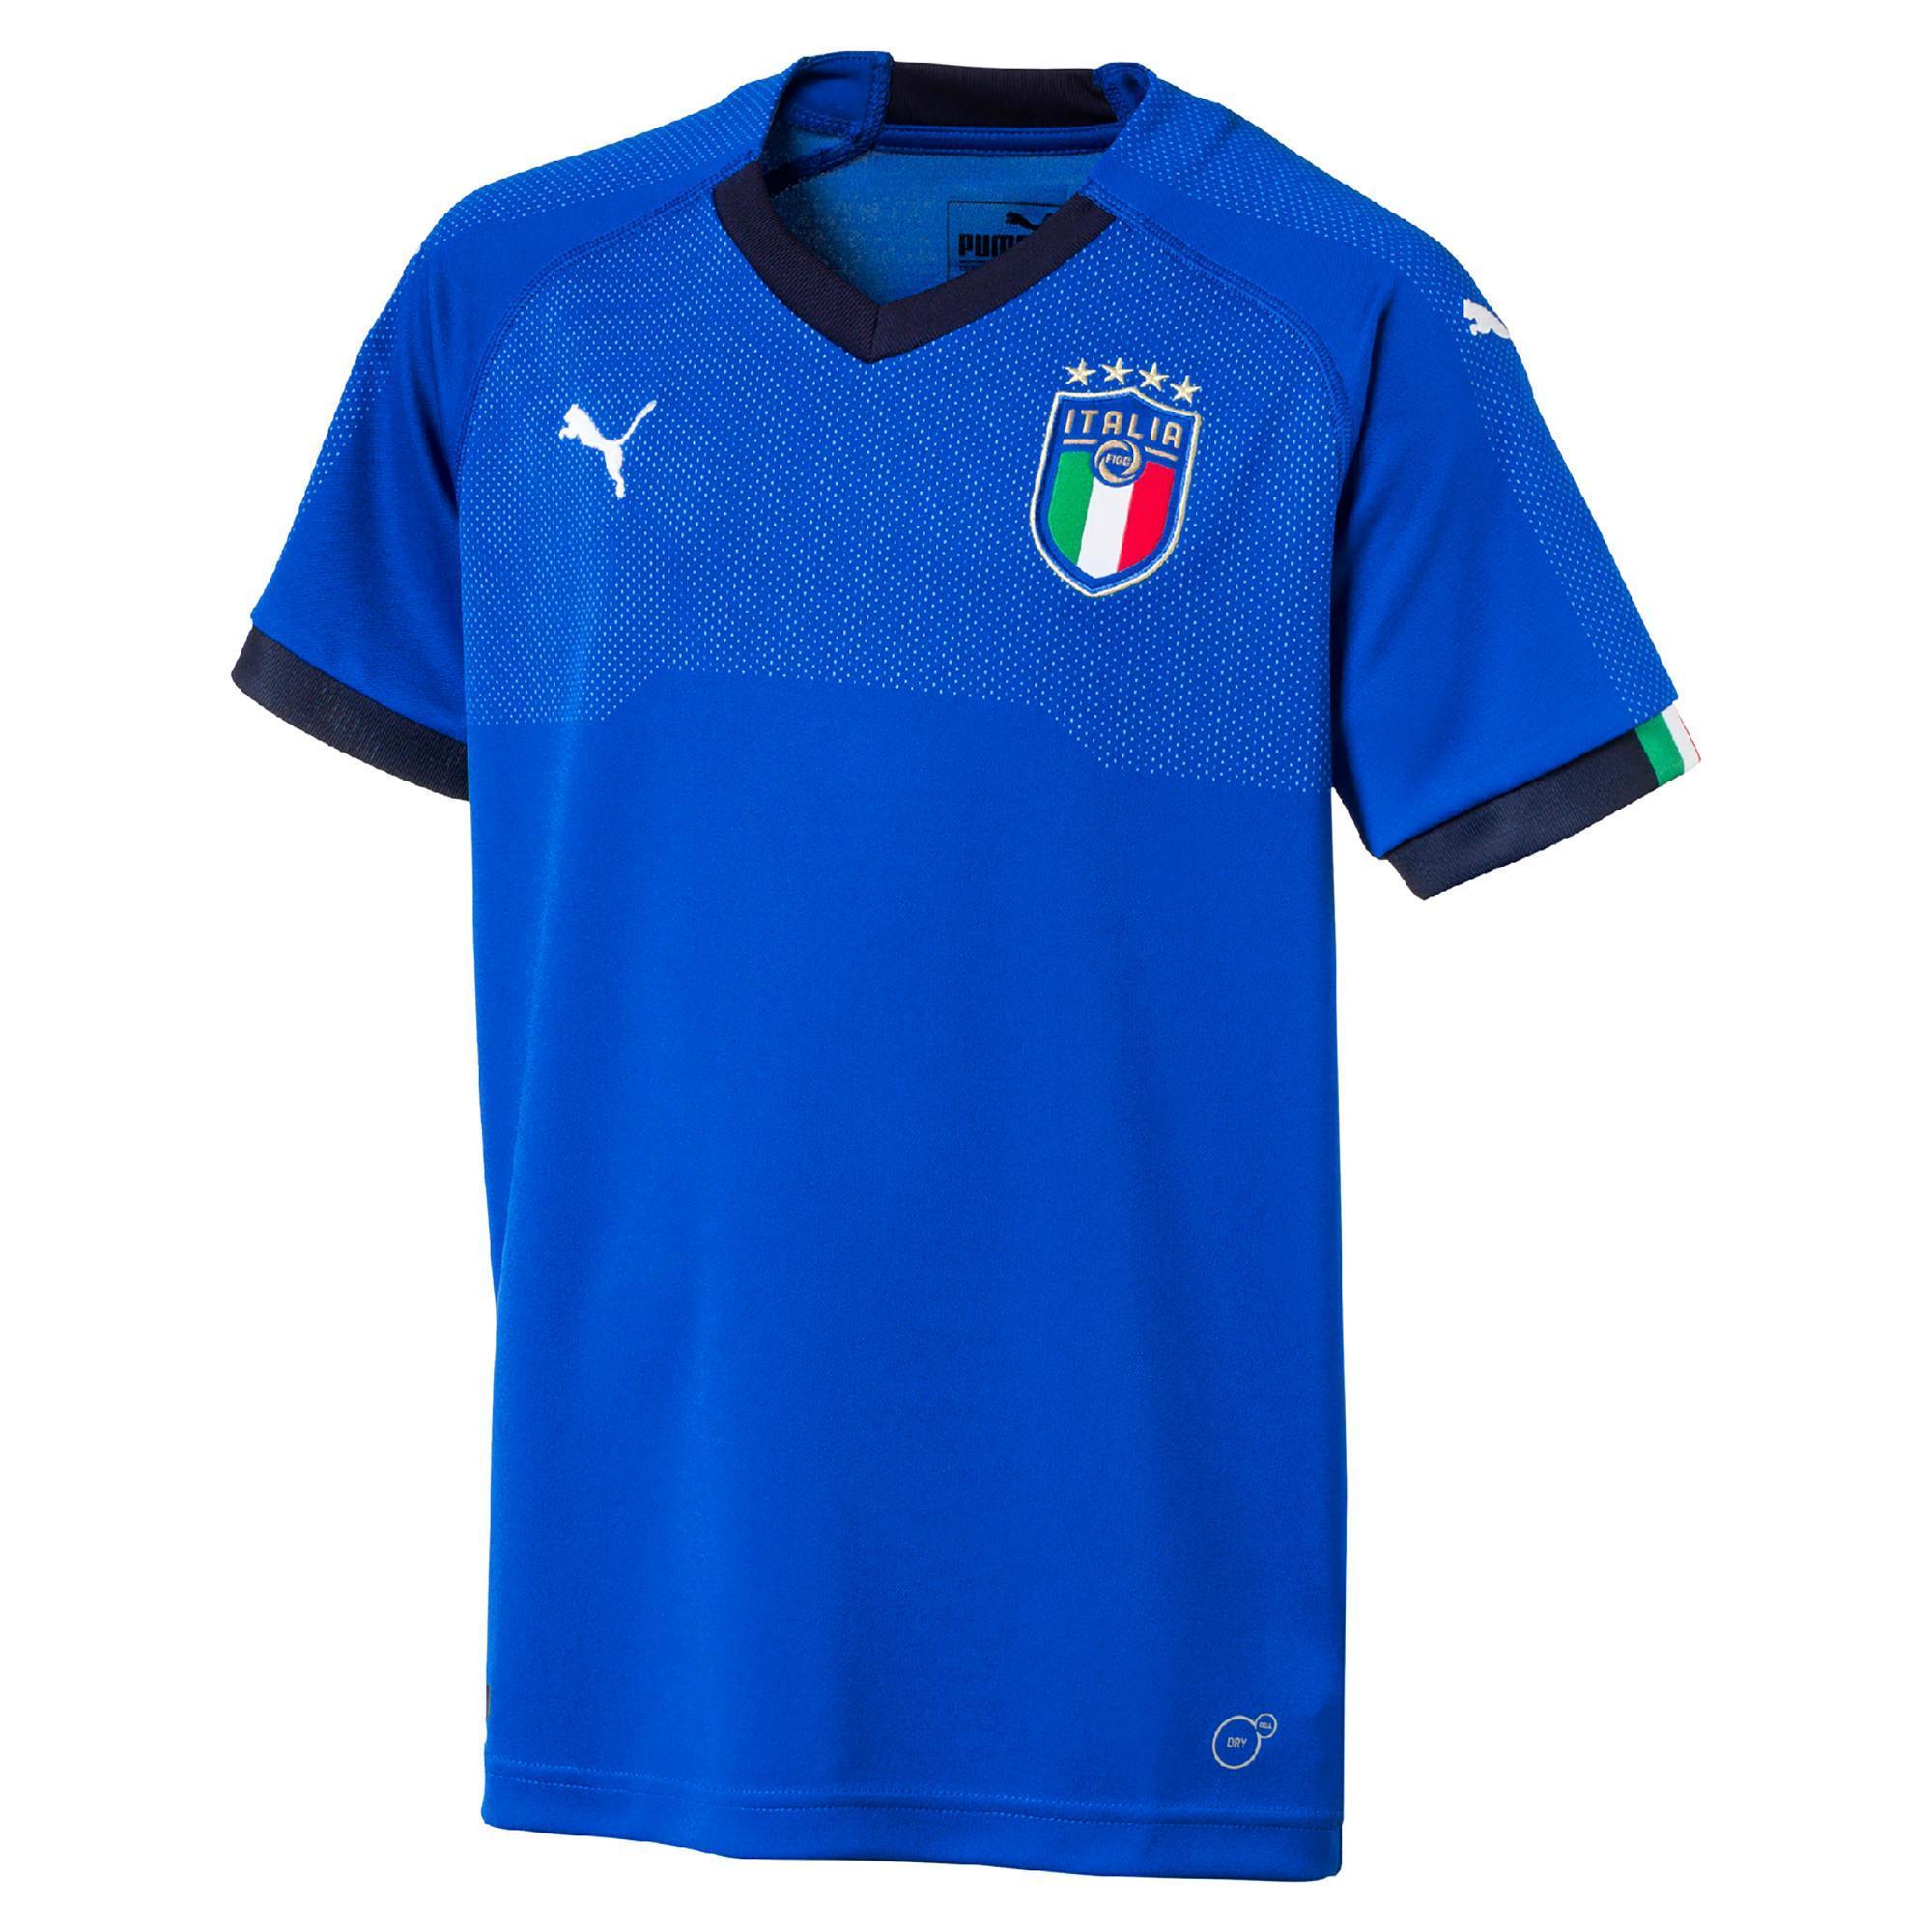 bbeb5e484b Camiseta réplica fútbol niños Italia local 2018 azul Puma